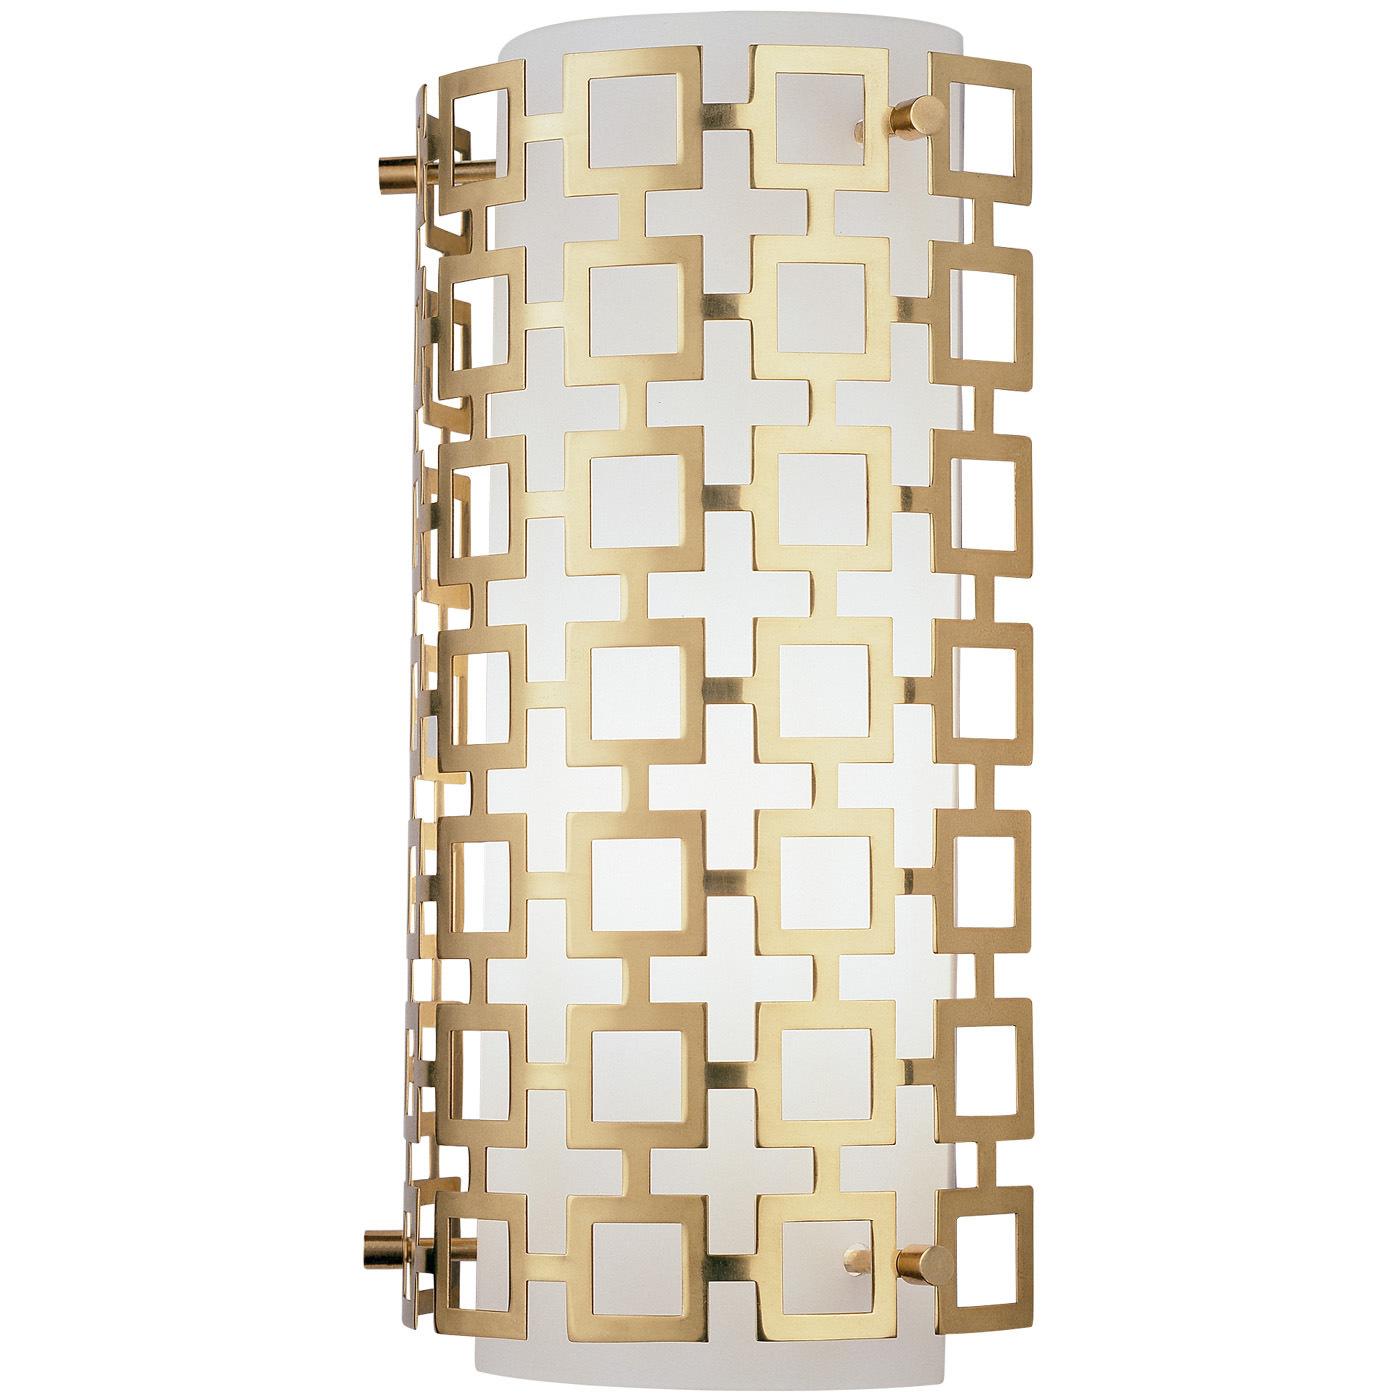 Wall Light by Jonathan Adler ra 662